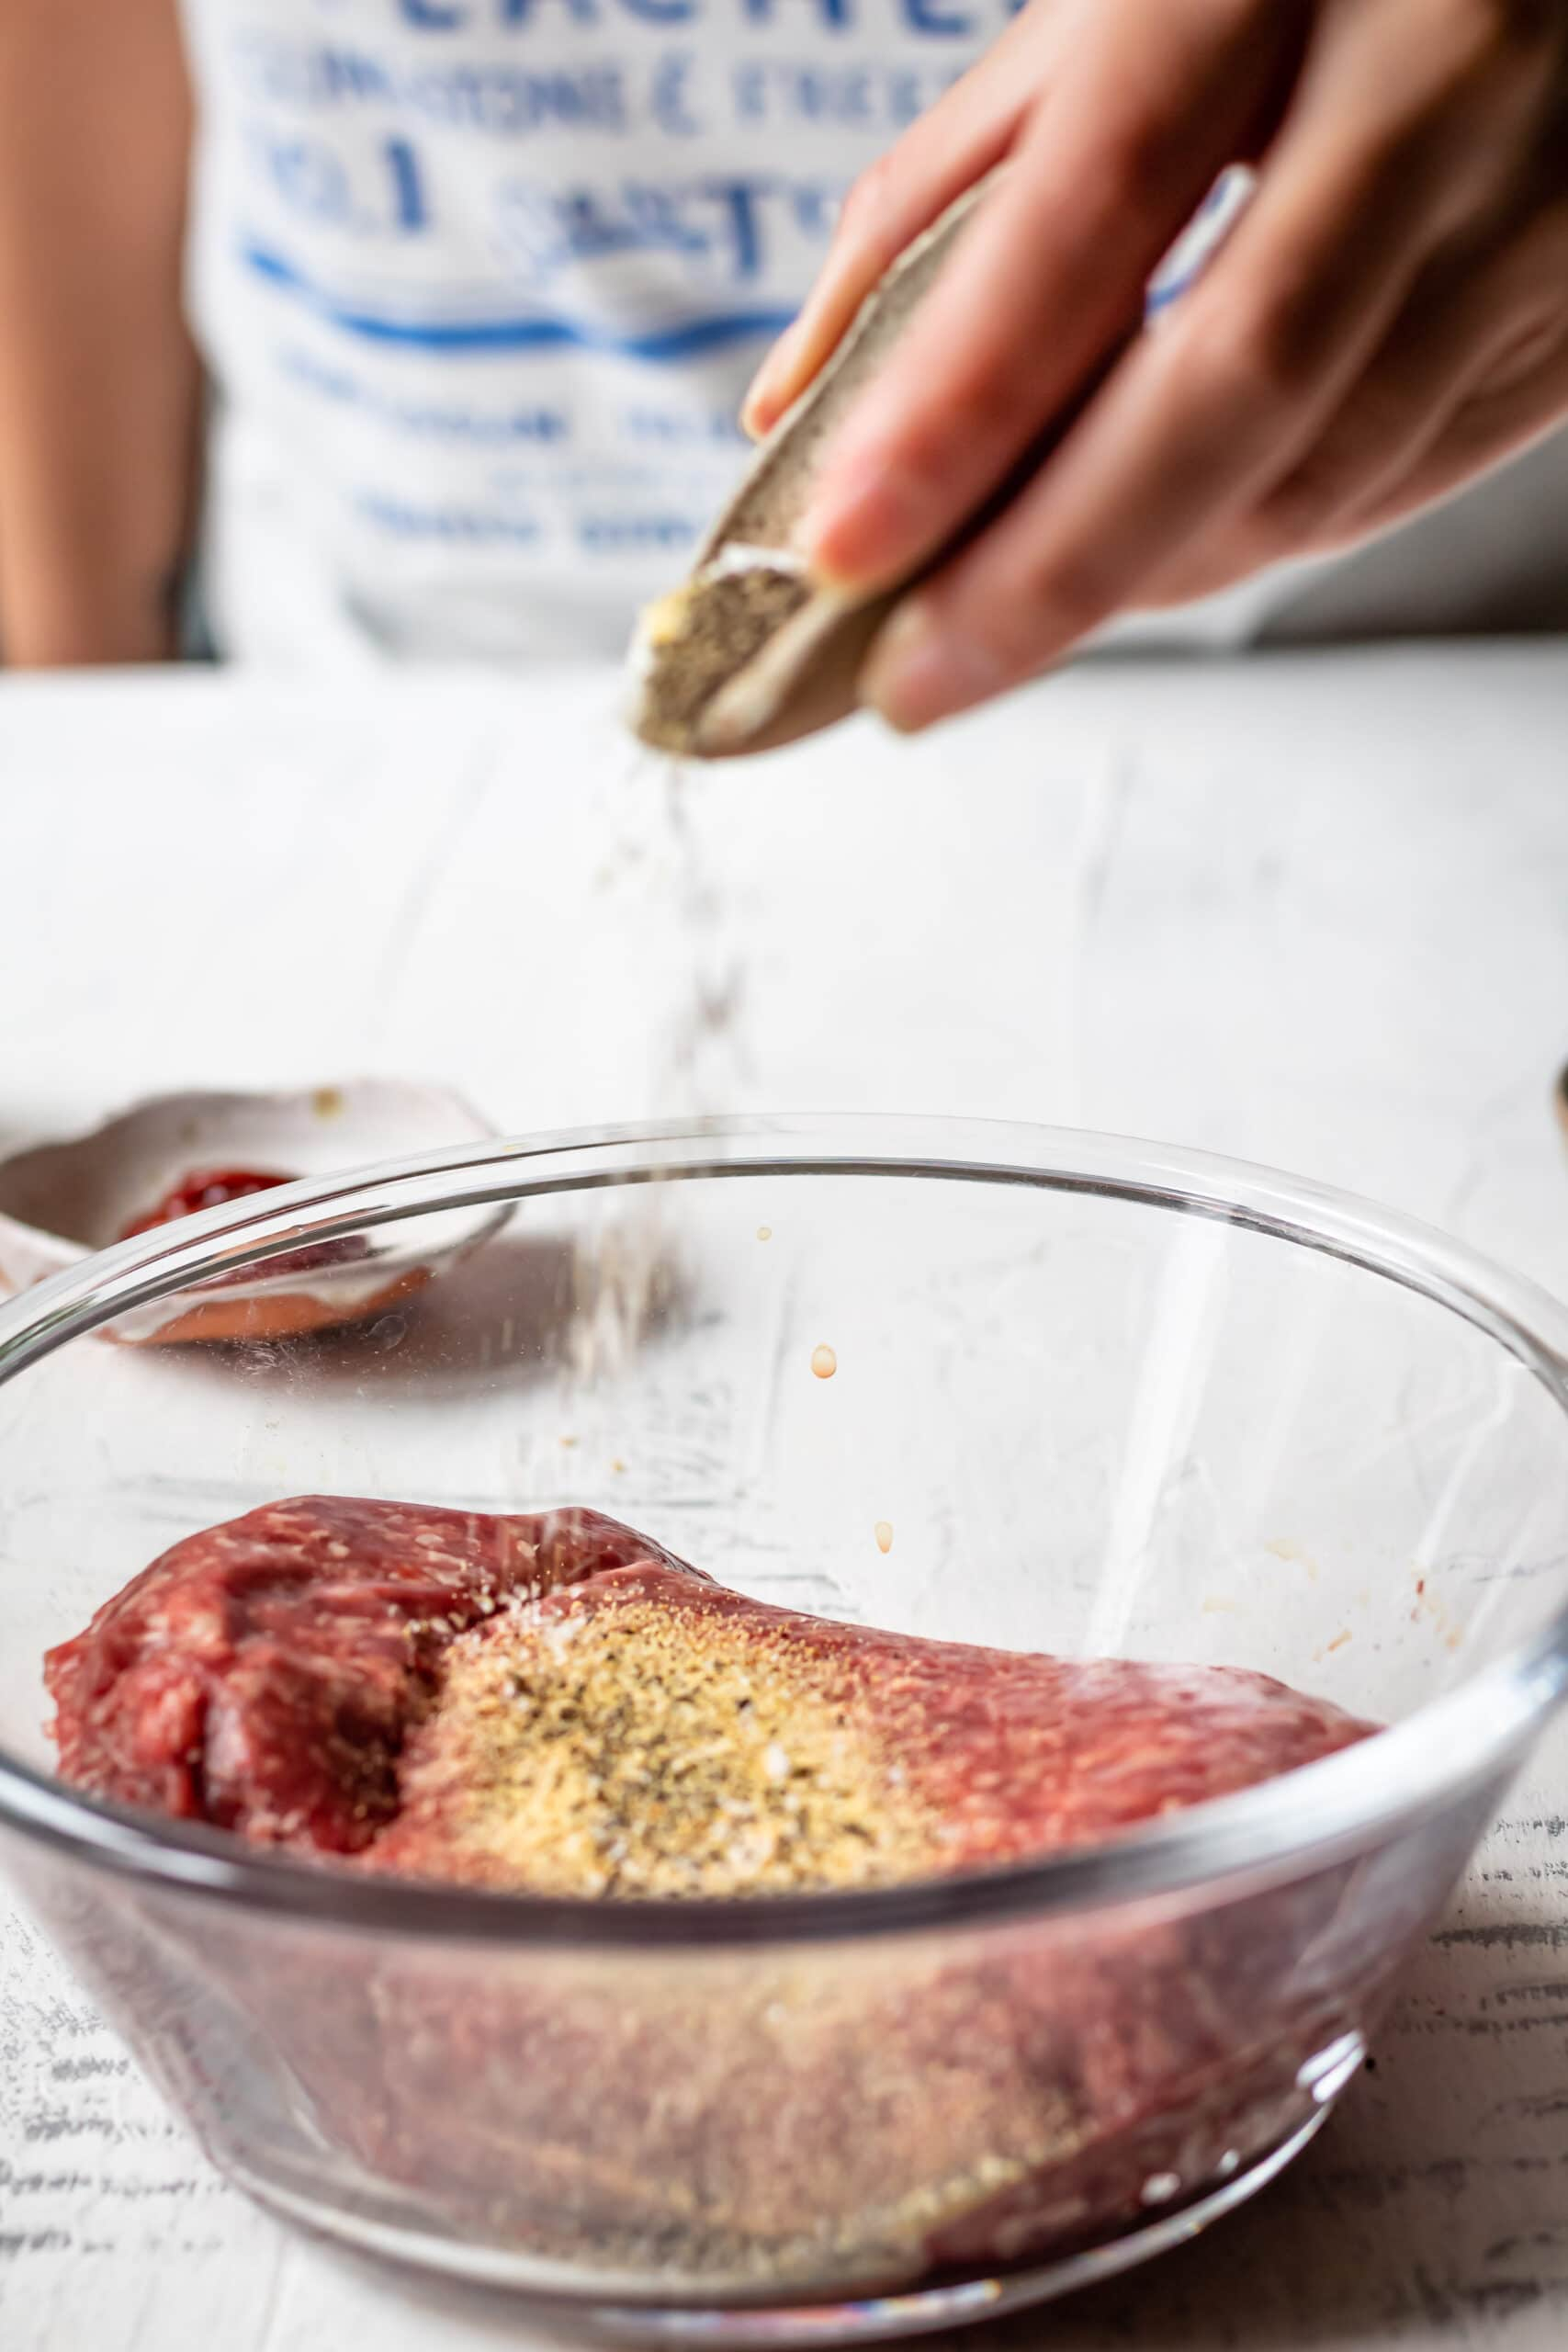 seasoning the hamburger meat